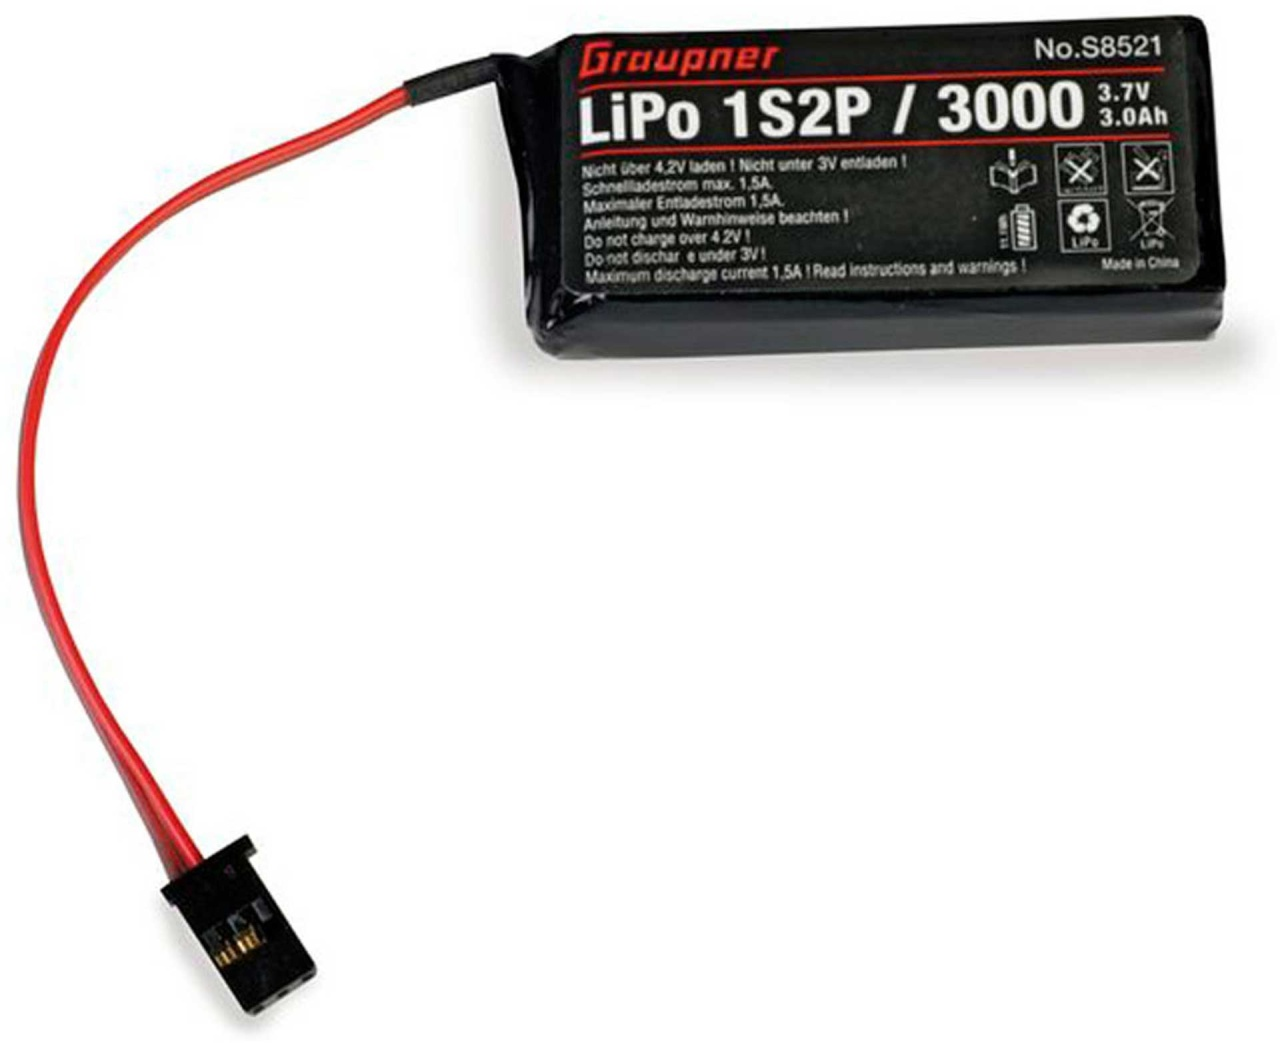 Graupner Senderakku LiPo 1S2P/3000 TX 3,7V für MZ-12